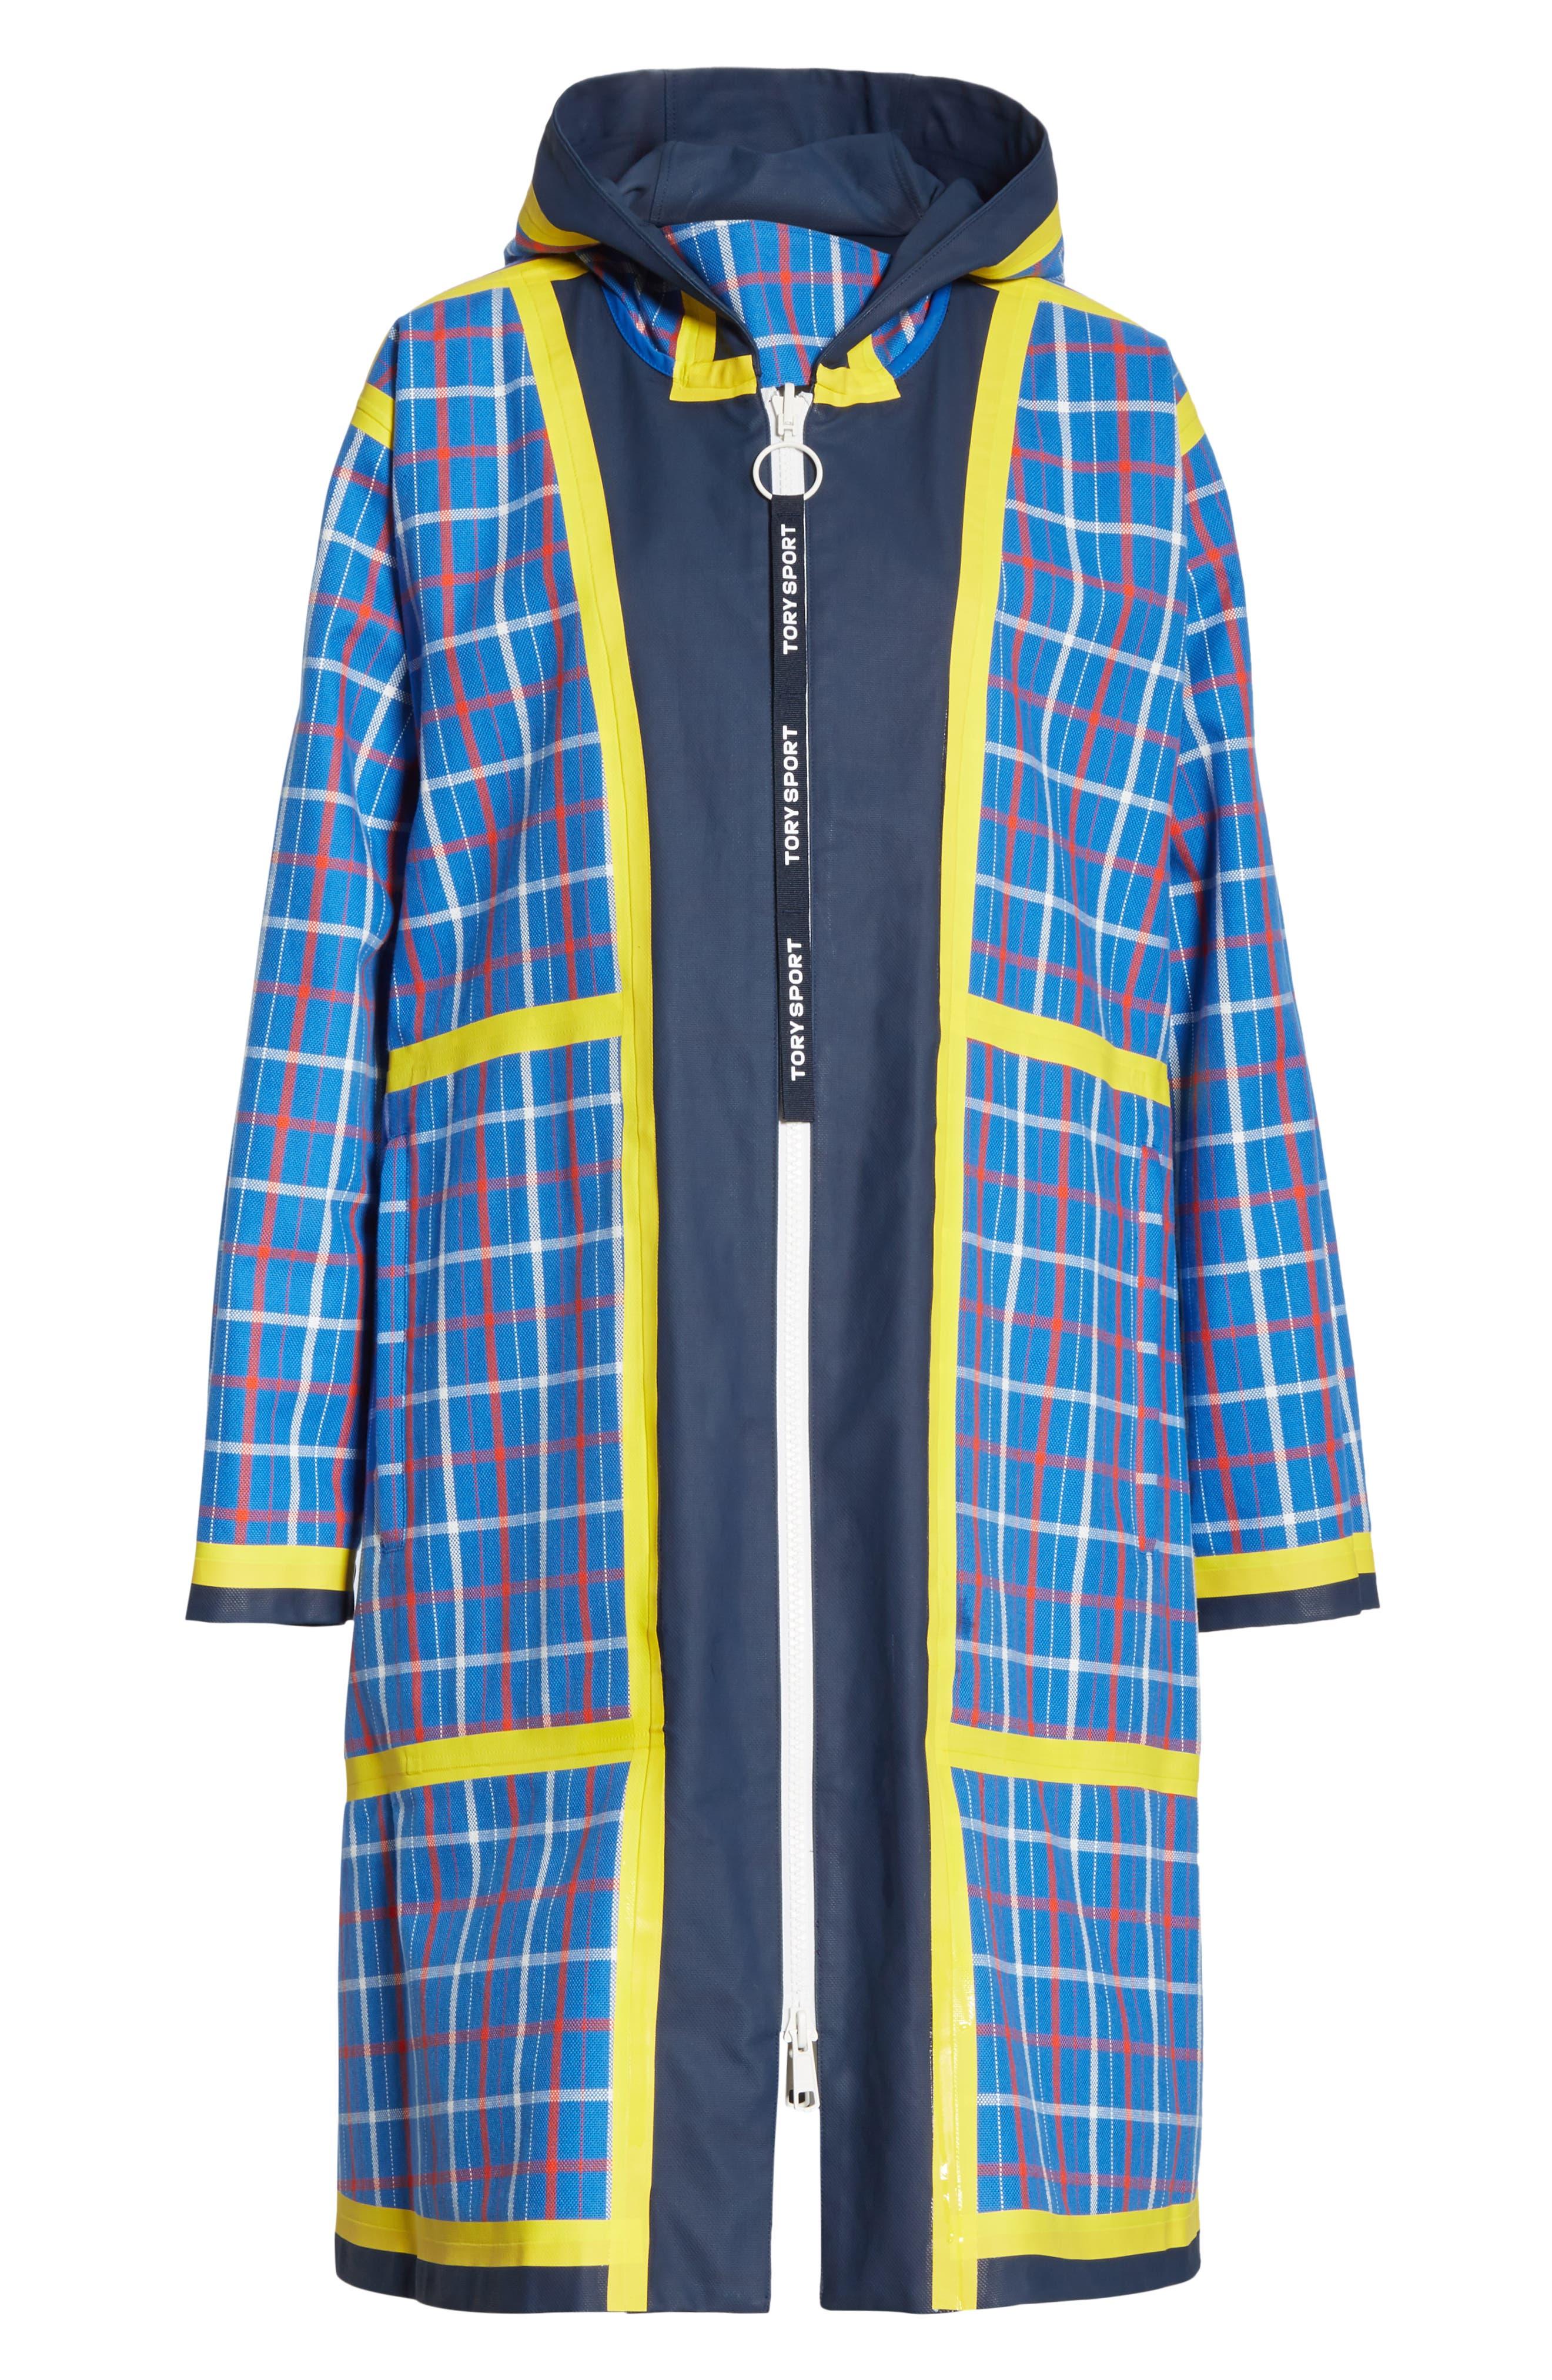 TORY SPORT, Reversible Coated Canvas Rain Coat, Alternate thumbnail 7, color, TANDEM PLAID LARGE SURF BLUE